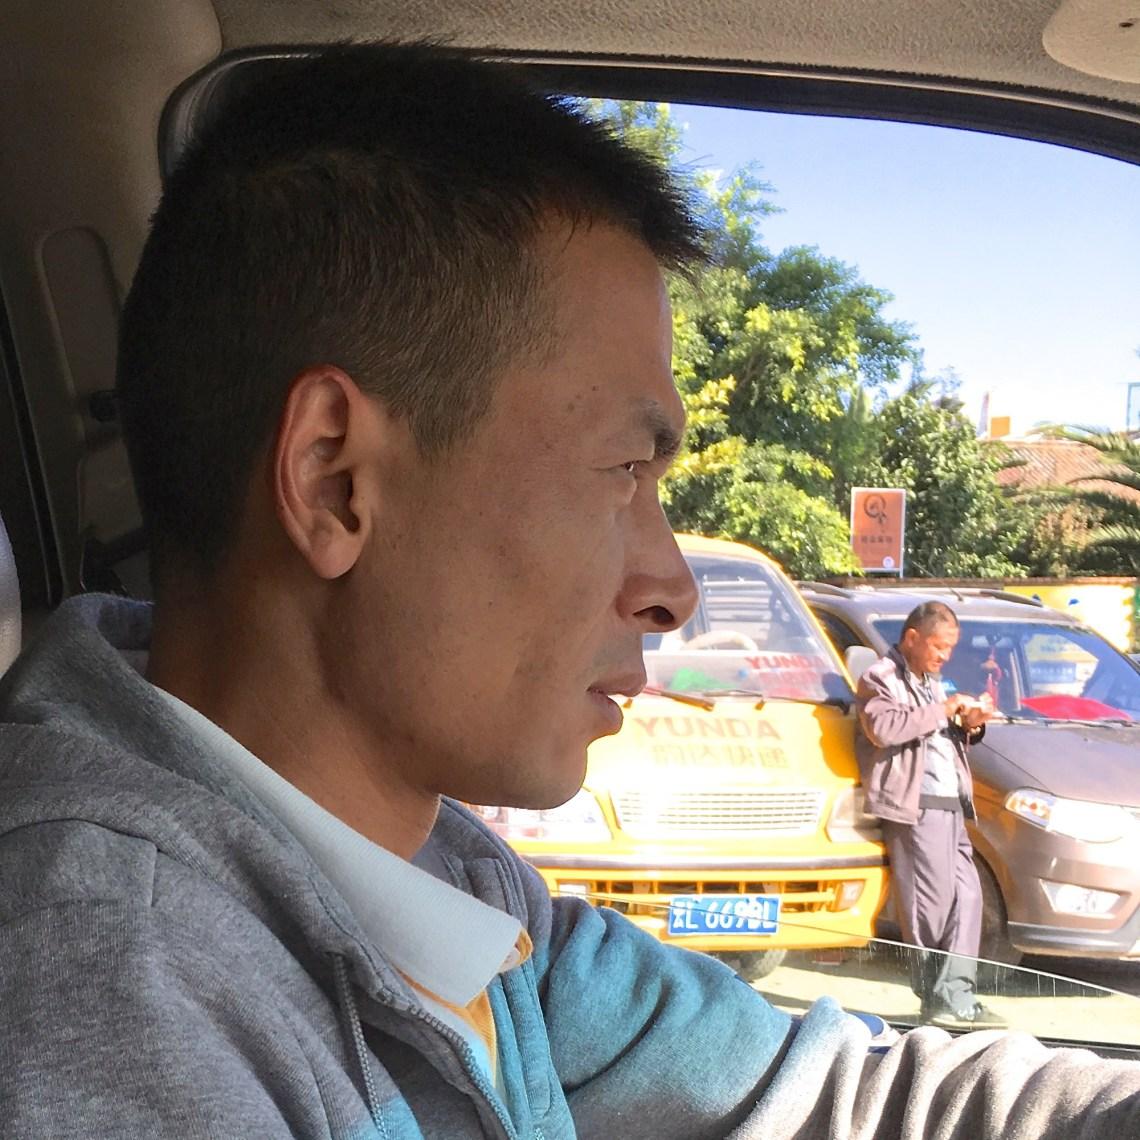 TaxifahrerDAli